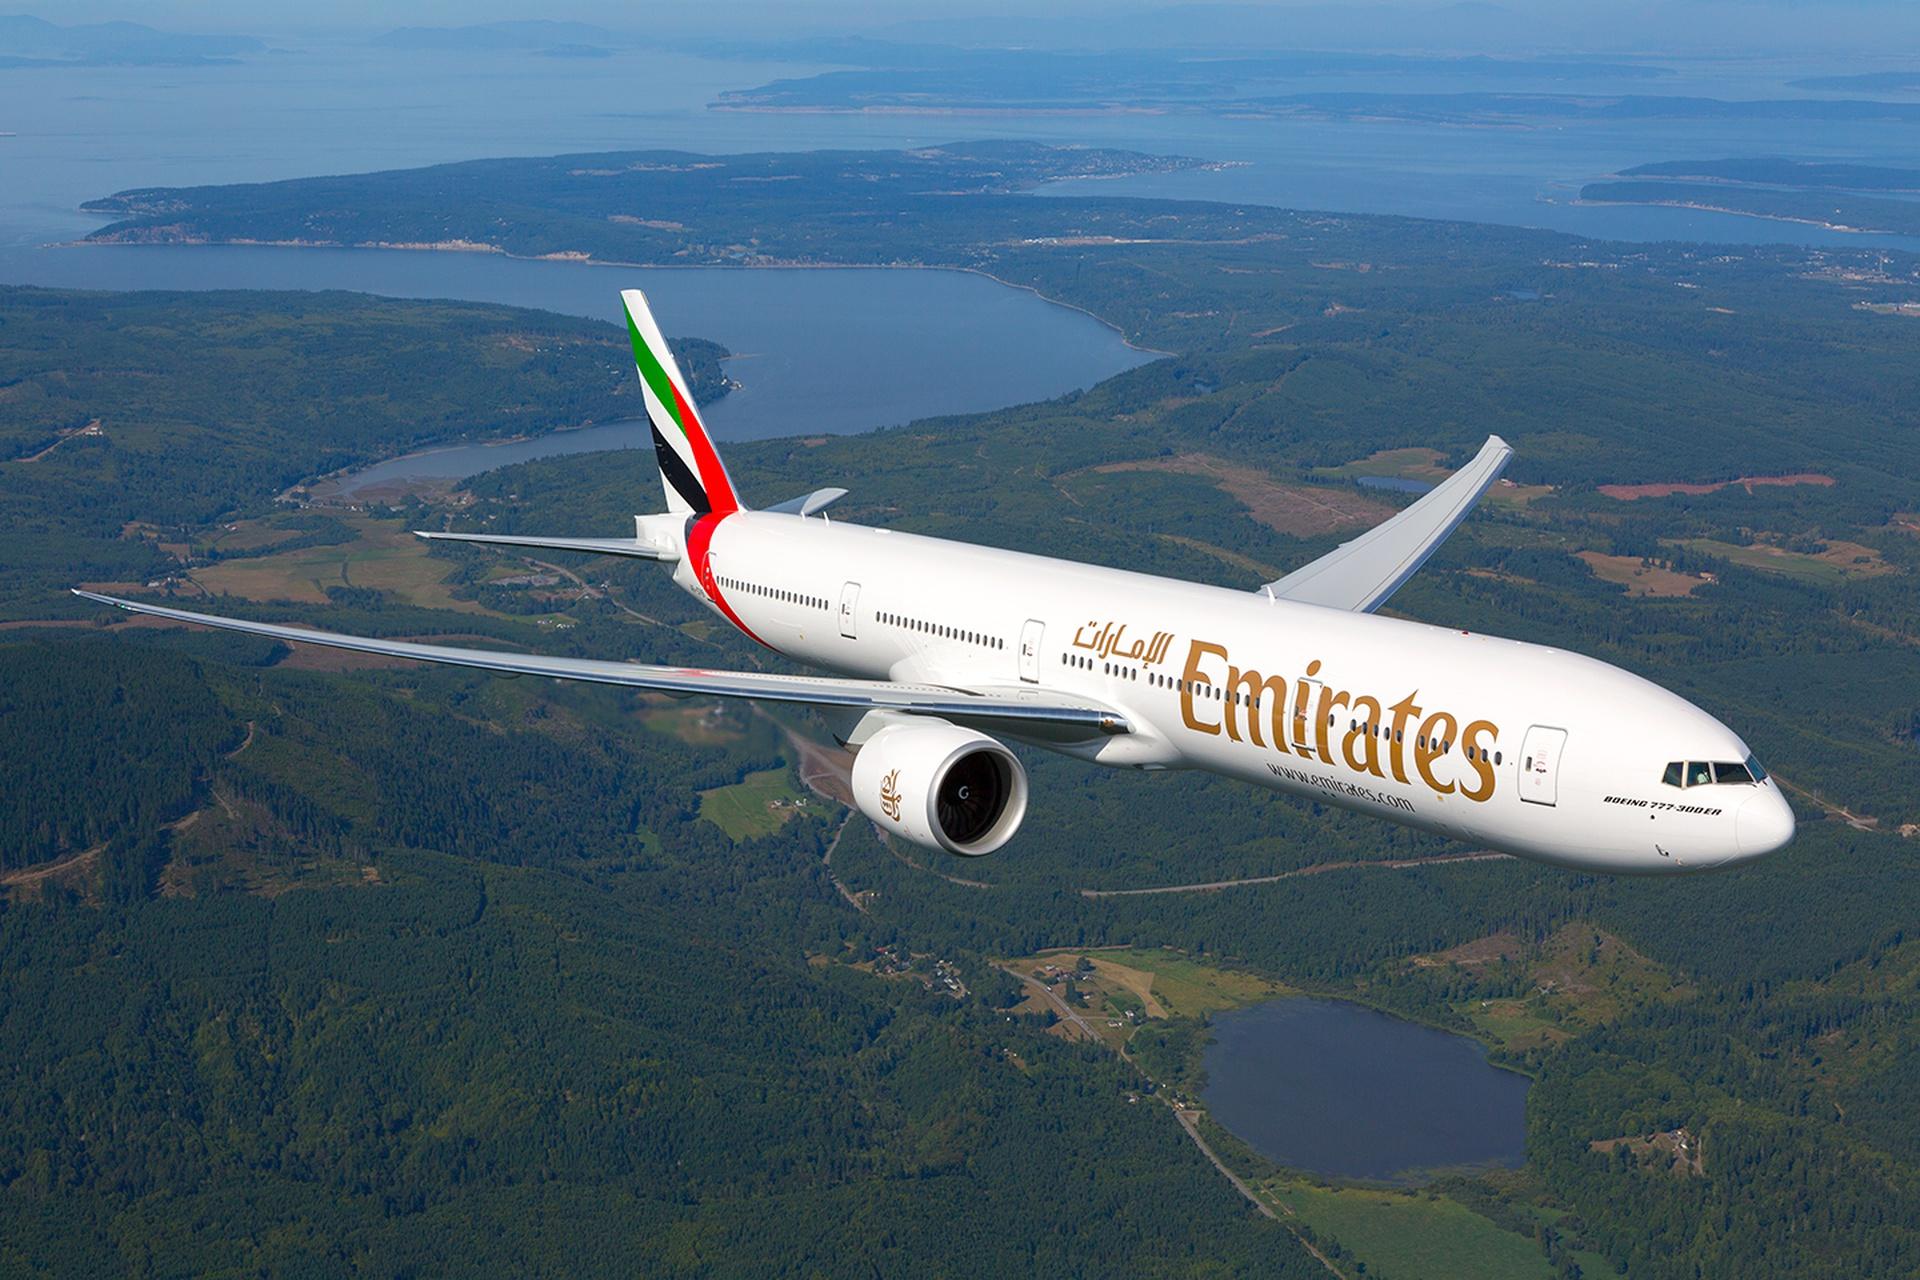 Emirates resumes flights to Addis Ababa, Guangzhou, Oslo and Tehran